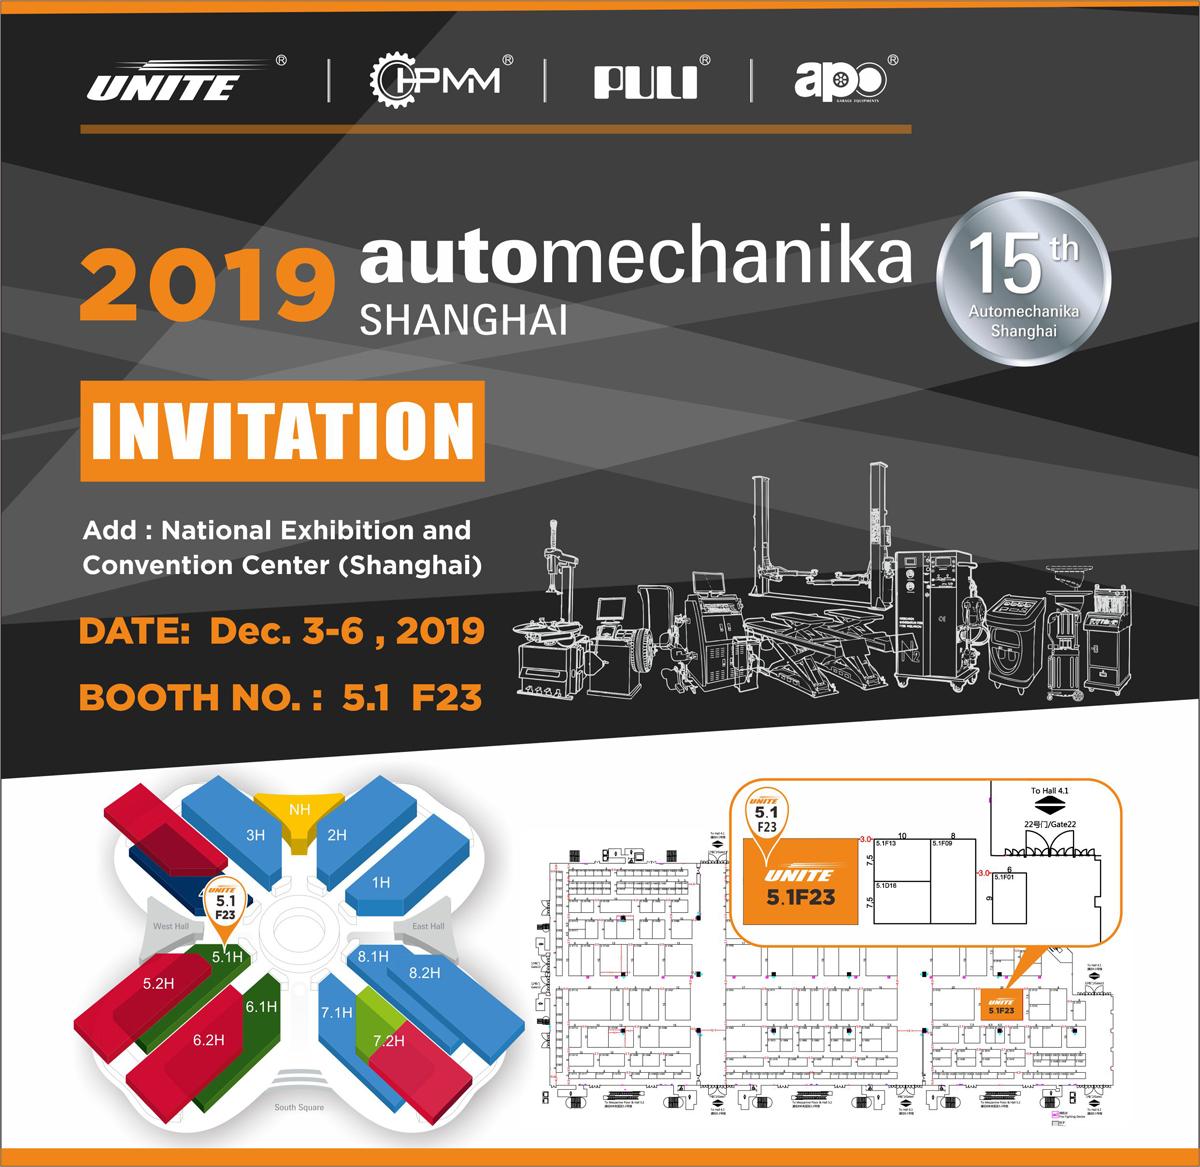 Invitation for Automechanika Shanghai 2019